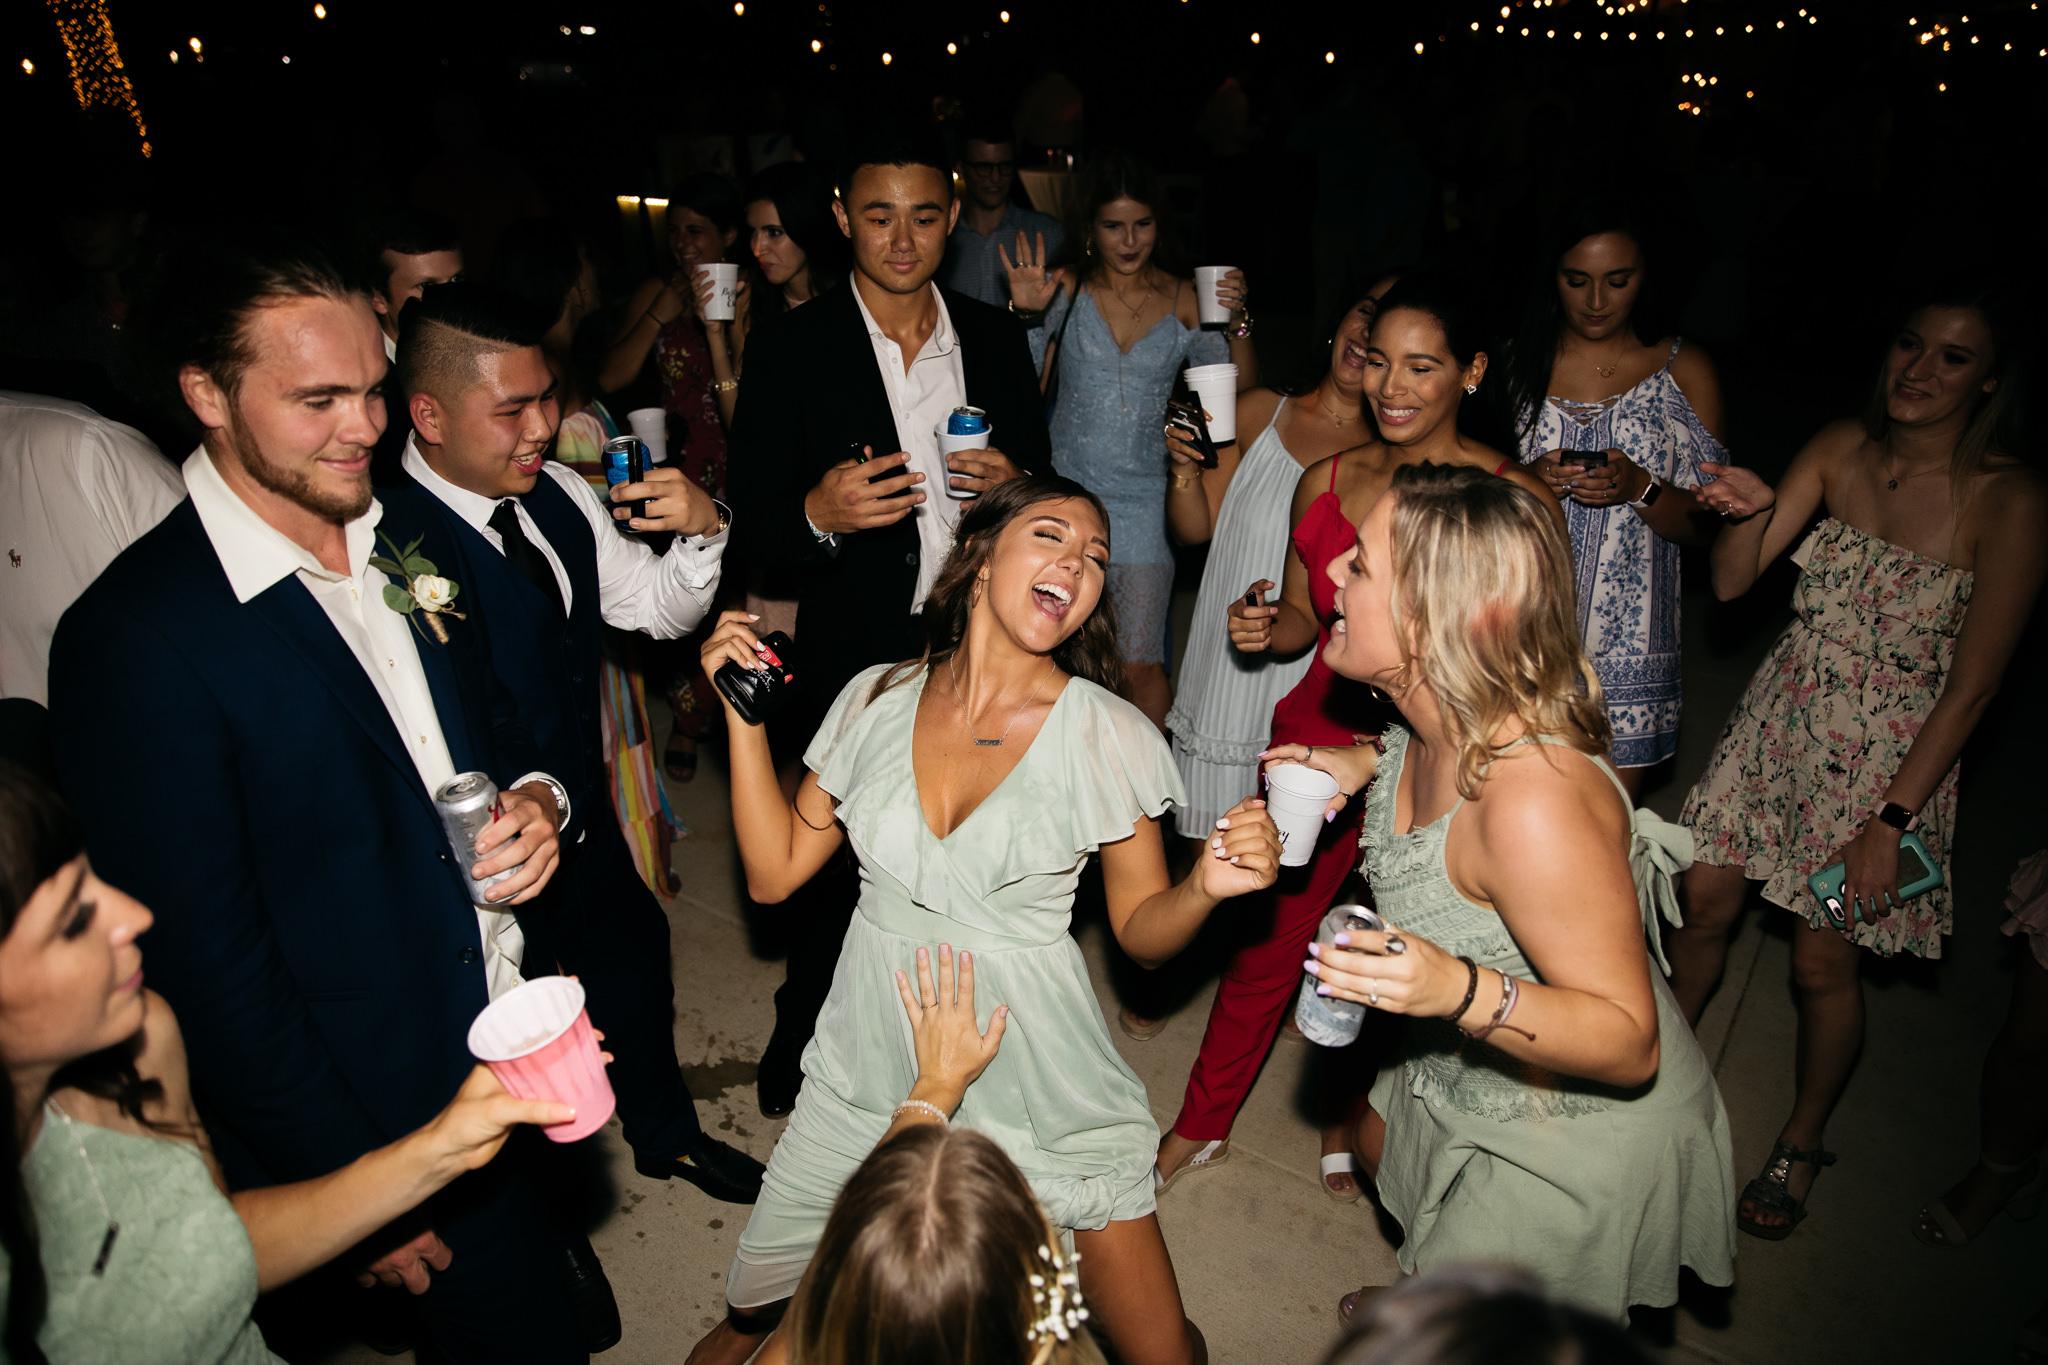 backyard-wedding-thewarmtharoundyou-lexy-branson-94.jpg